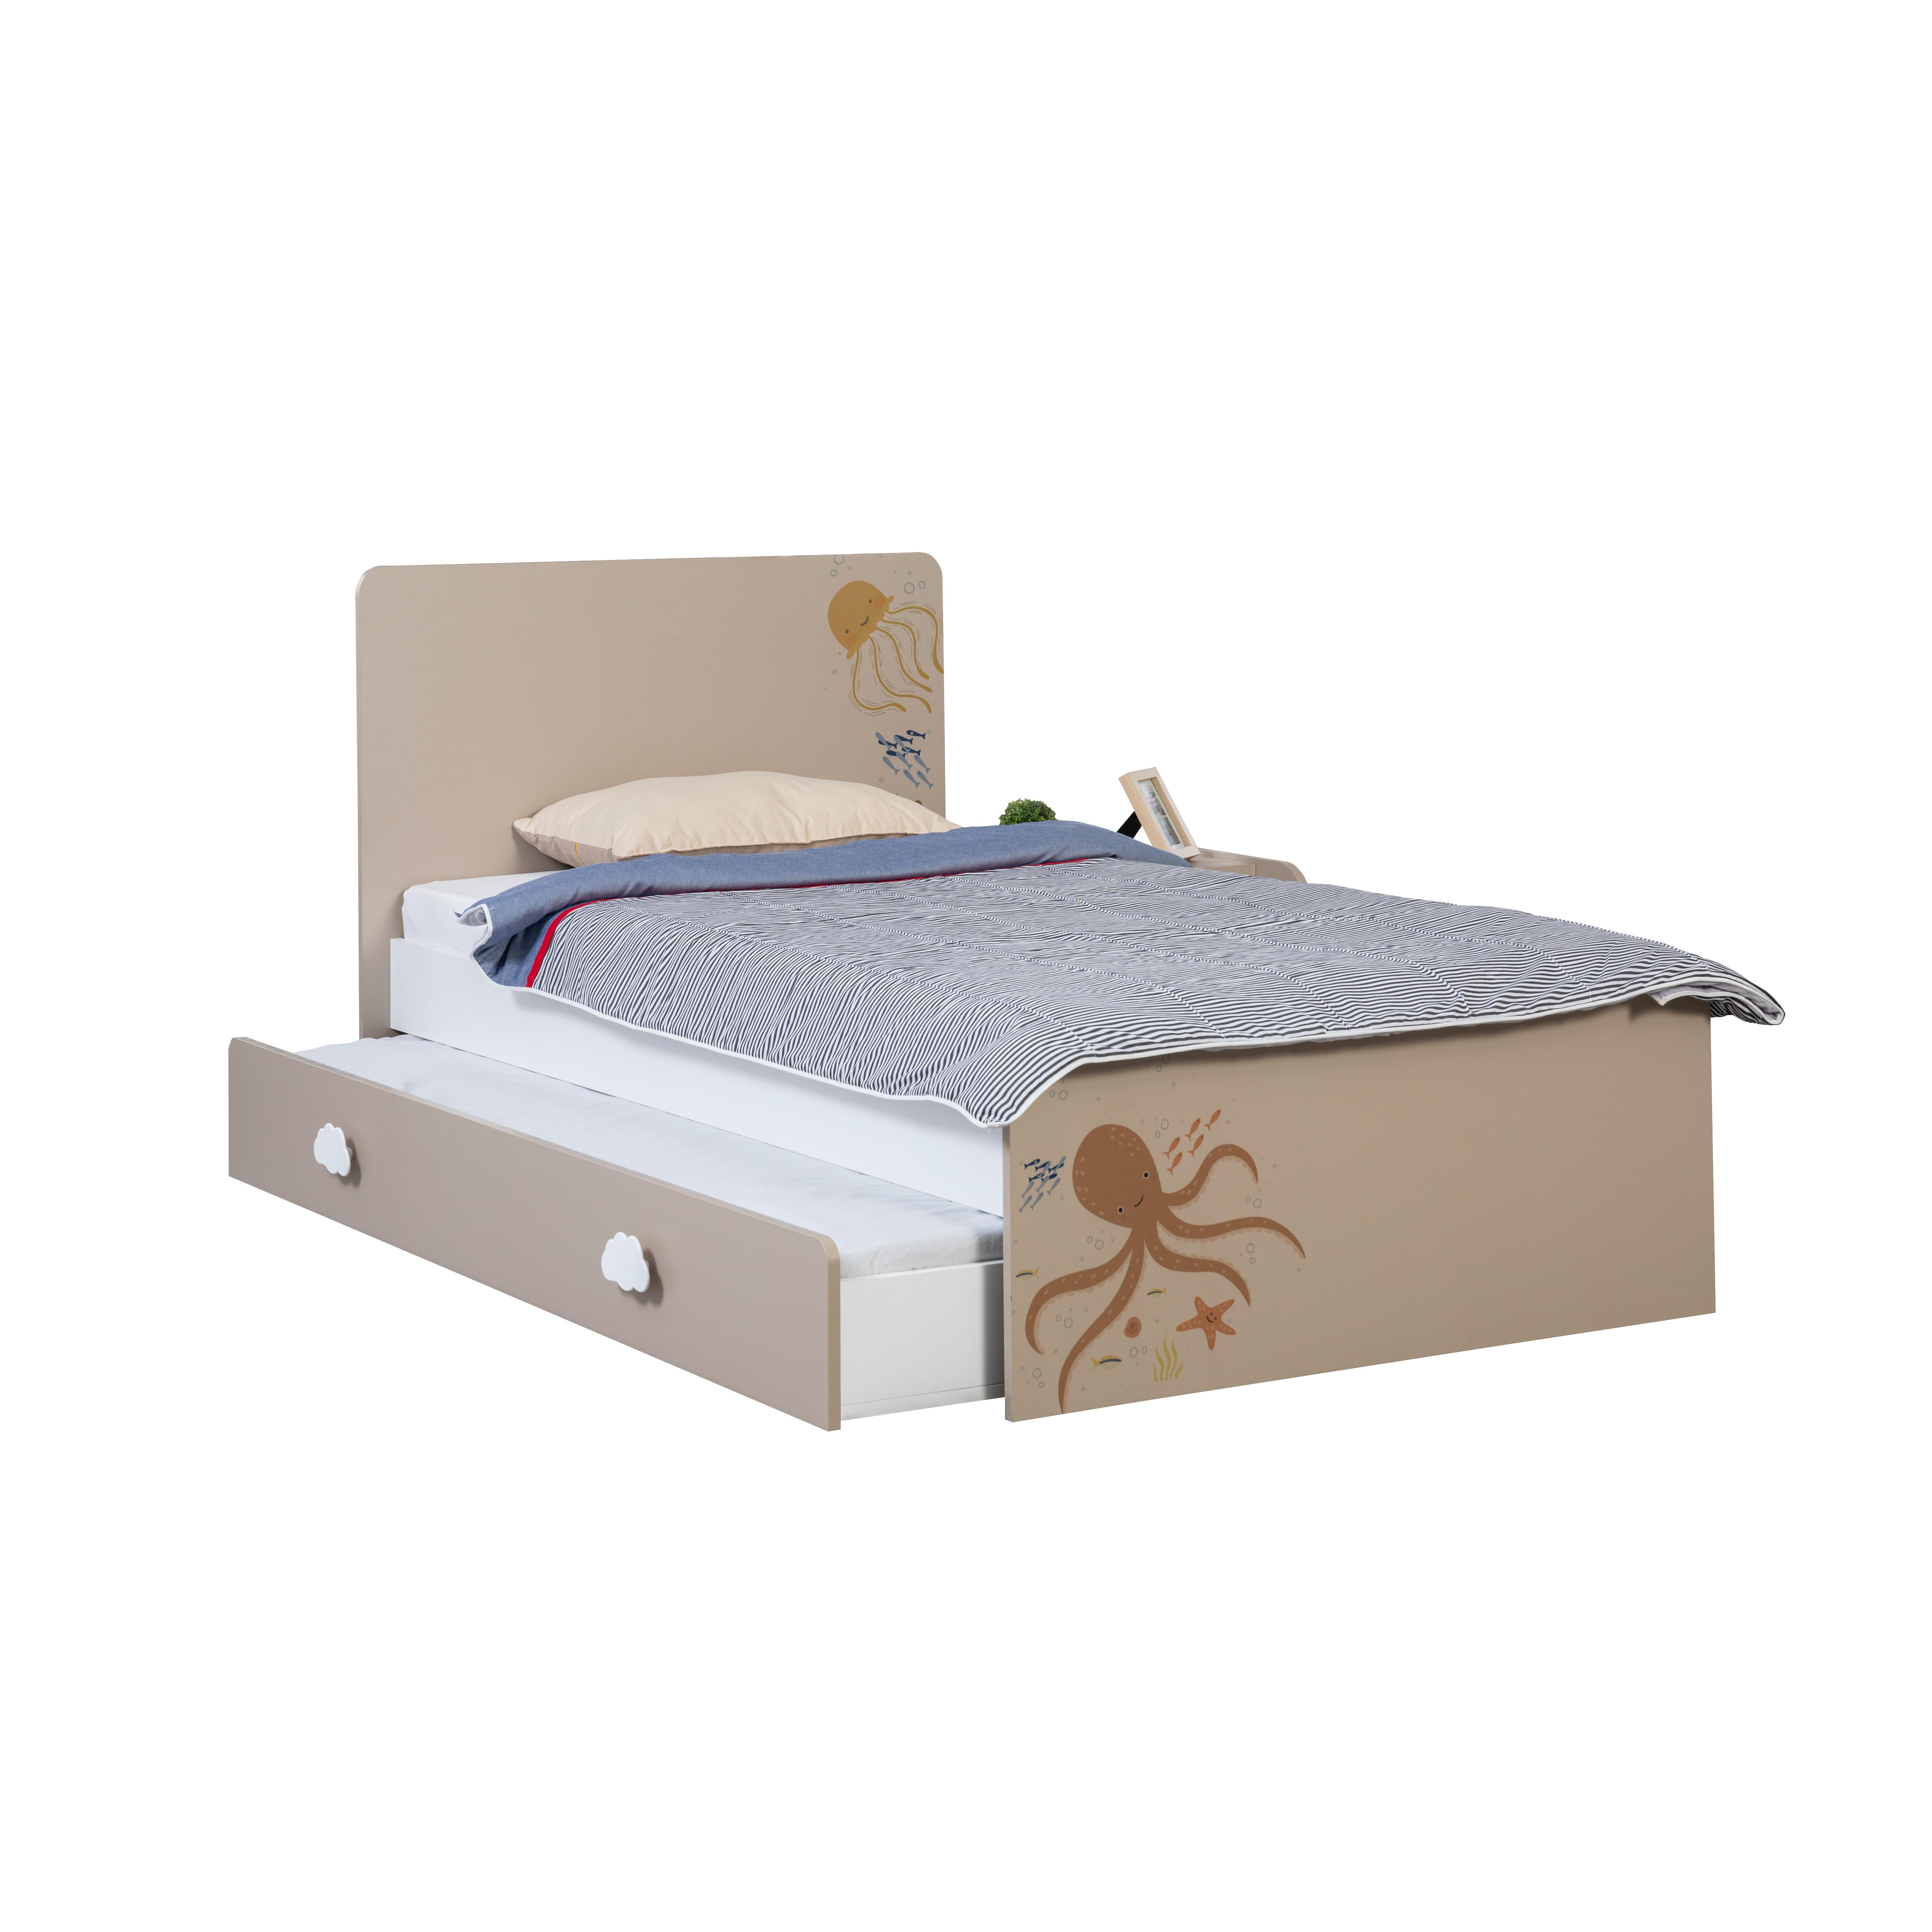 Titi Kinderbett Ocean in 100x200 cm mit Bettkasten